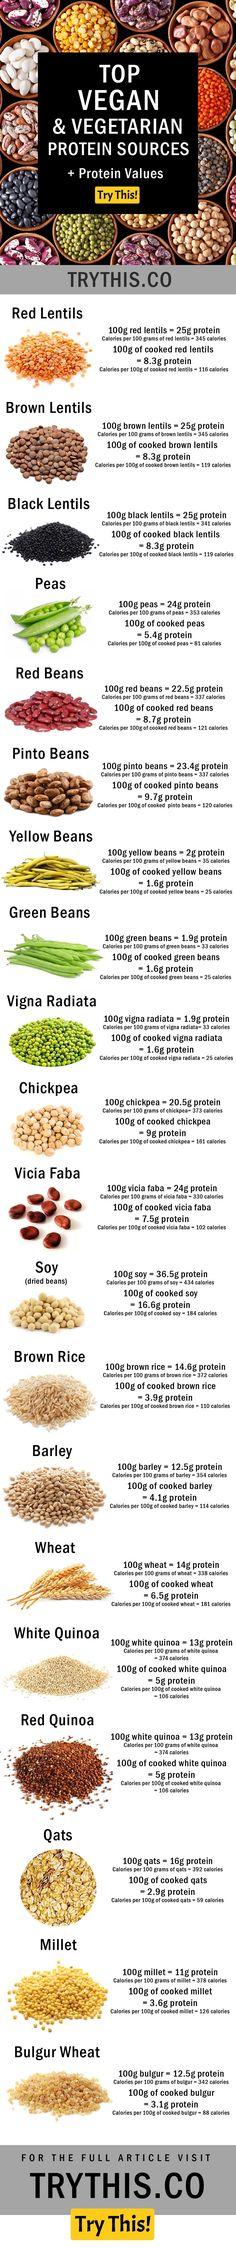 Vegan Protein: Top Vegan & Vegetarian Protein Sources